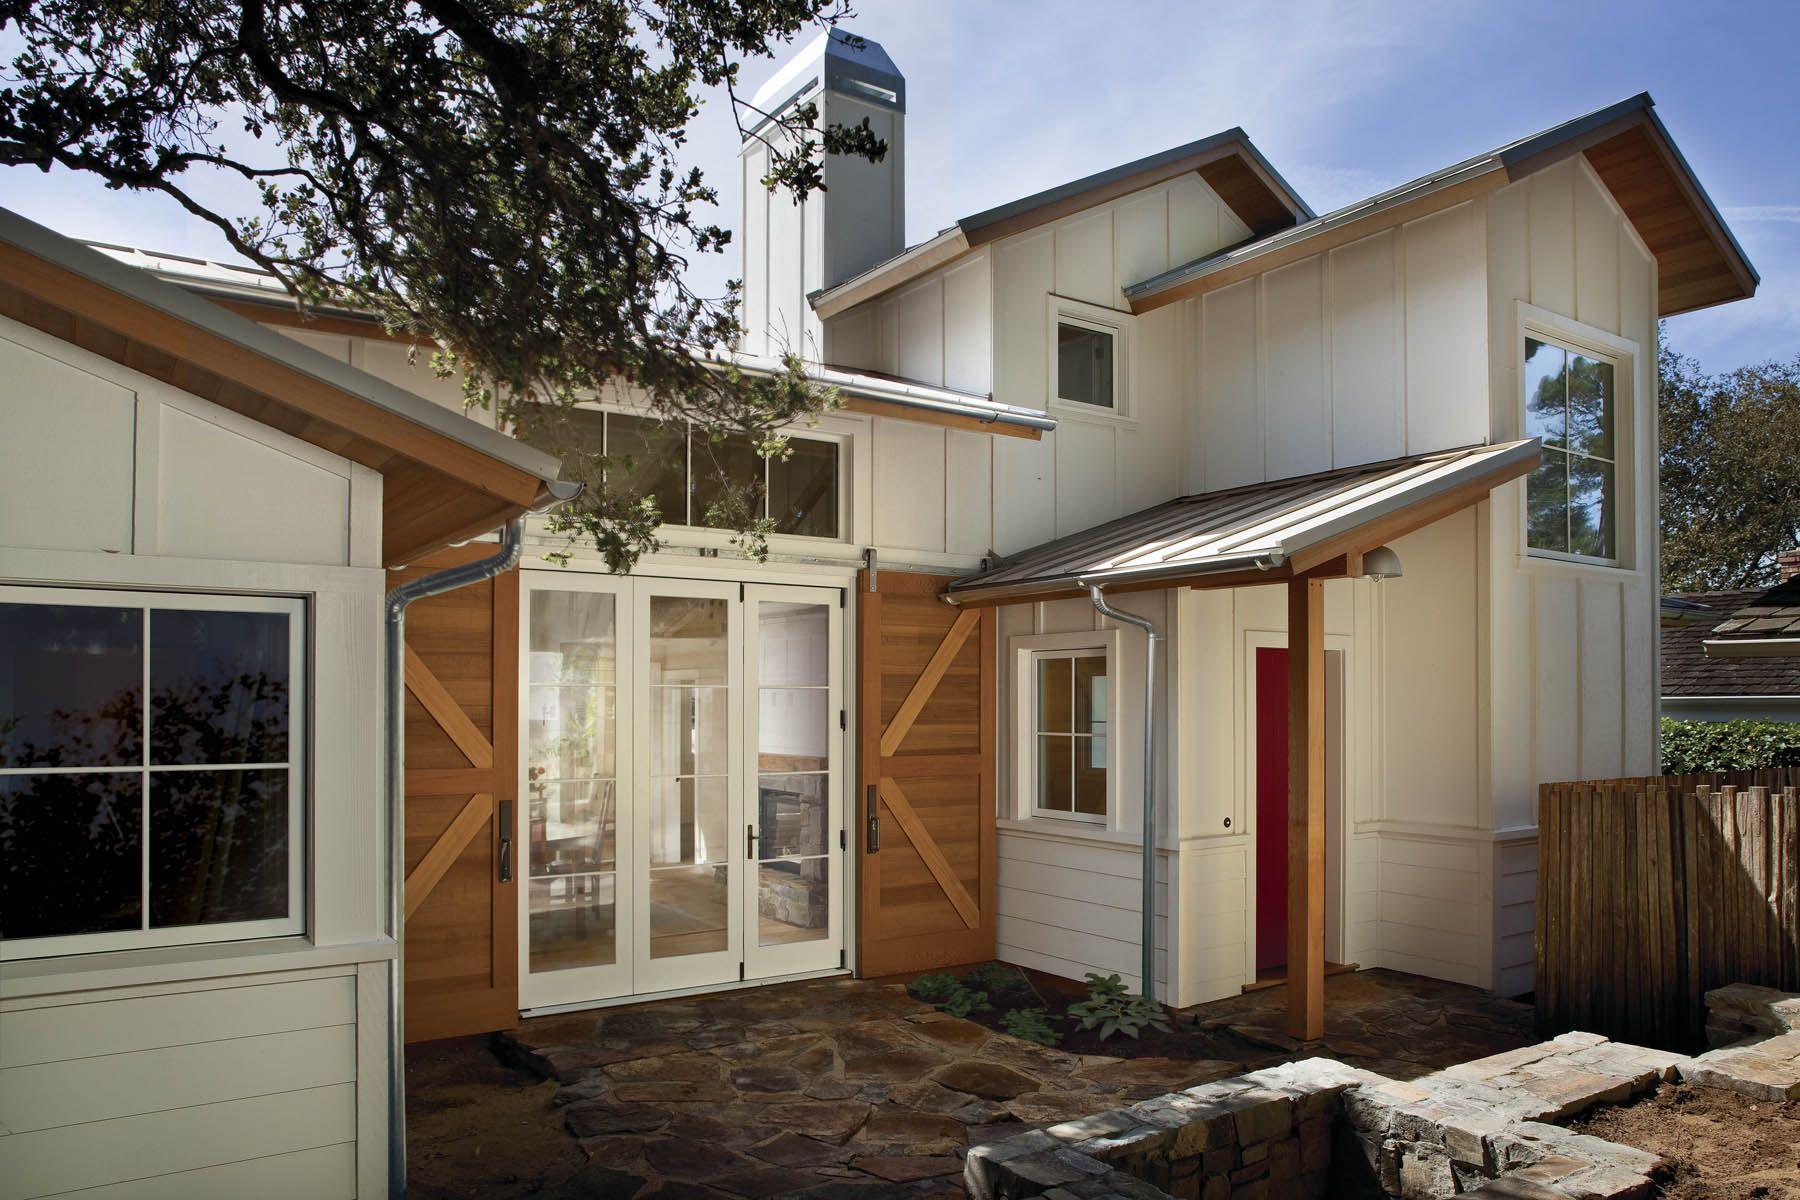 2013 house awards modern farmhouse for Finehomebuilding com houses